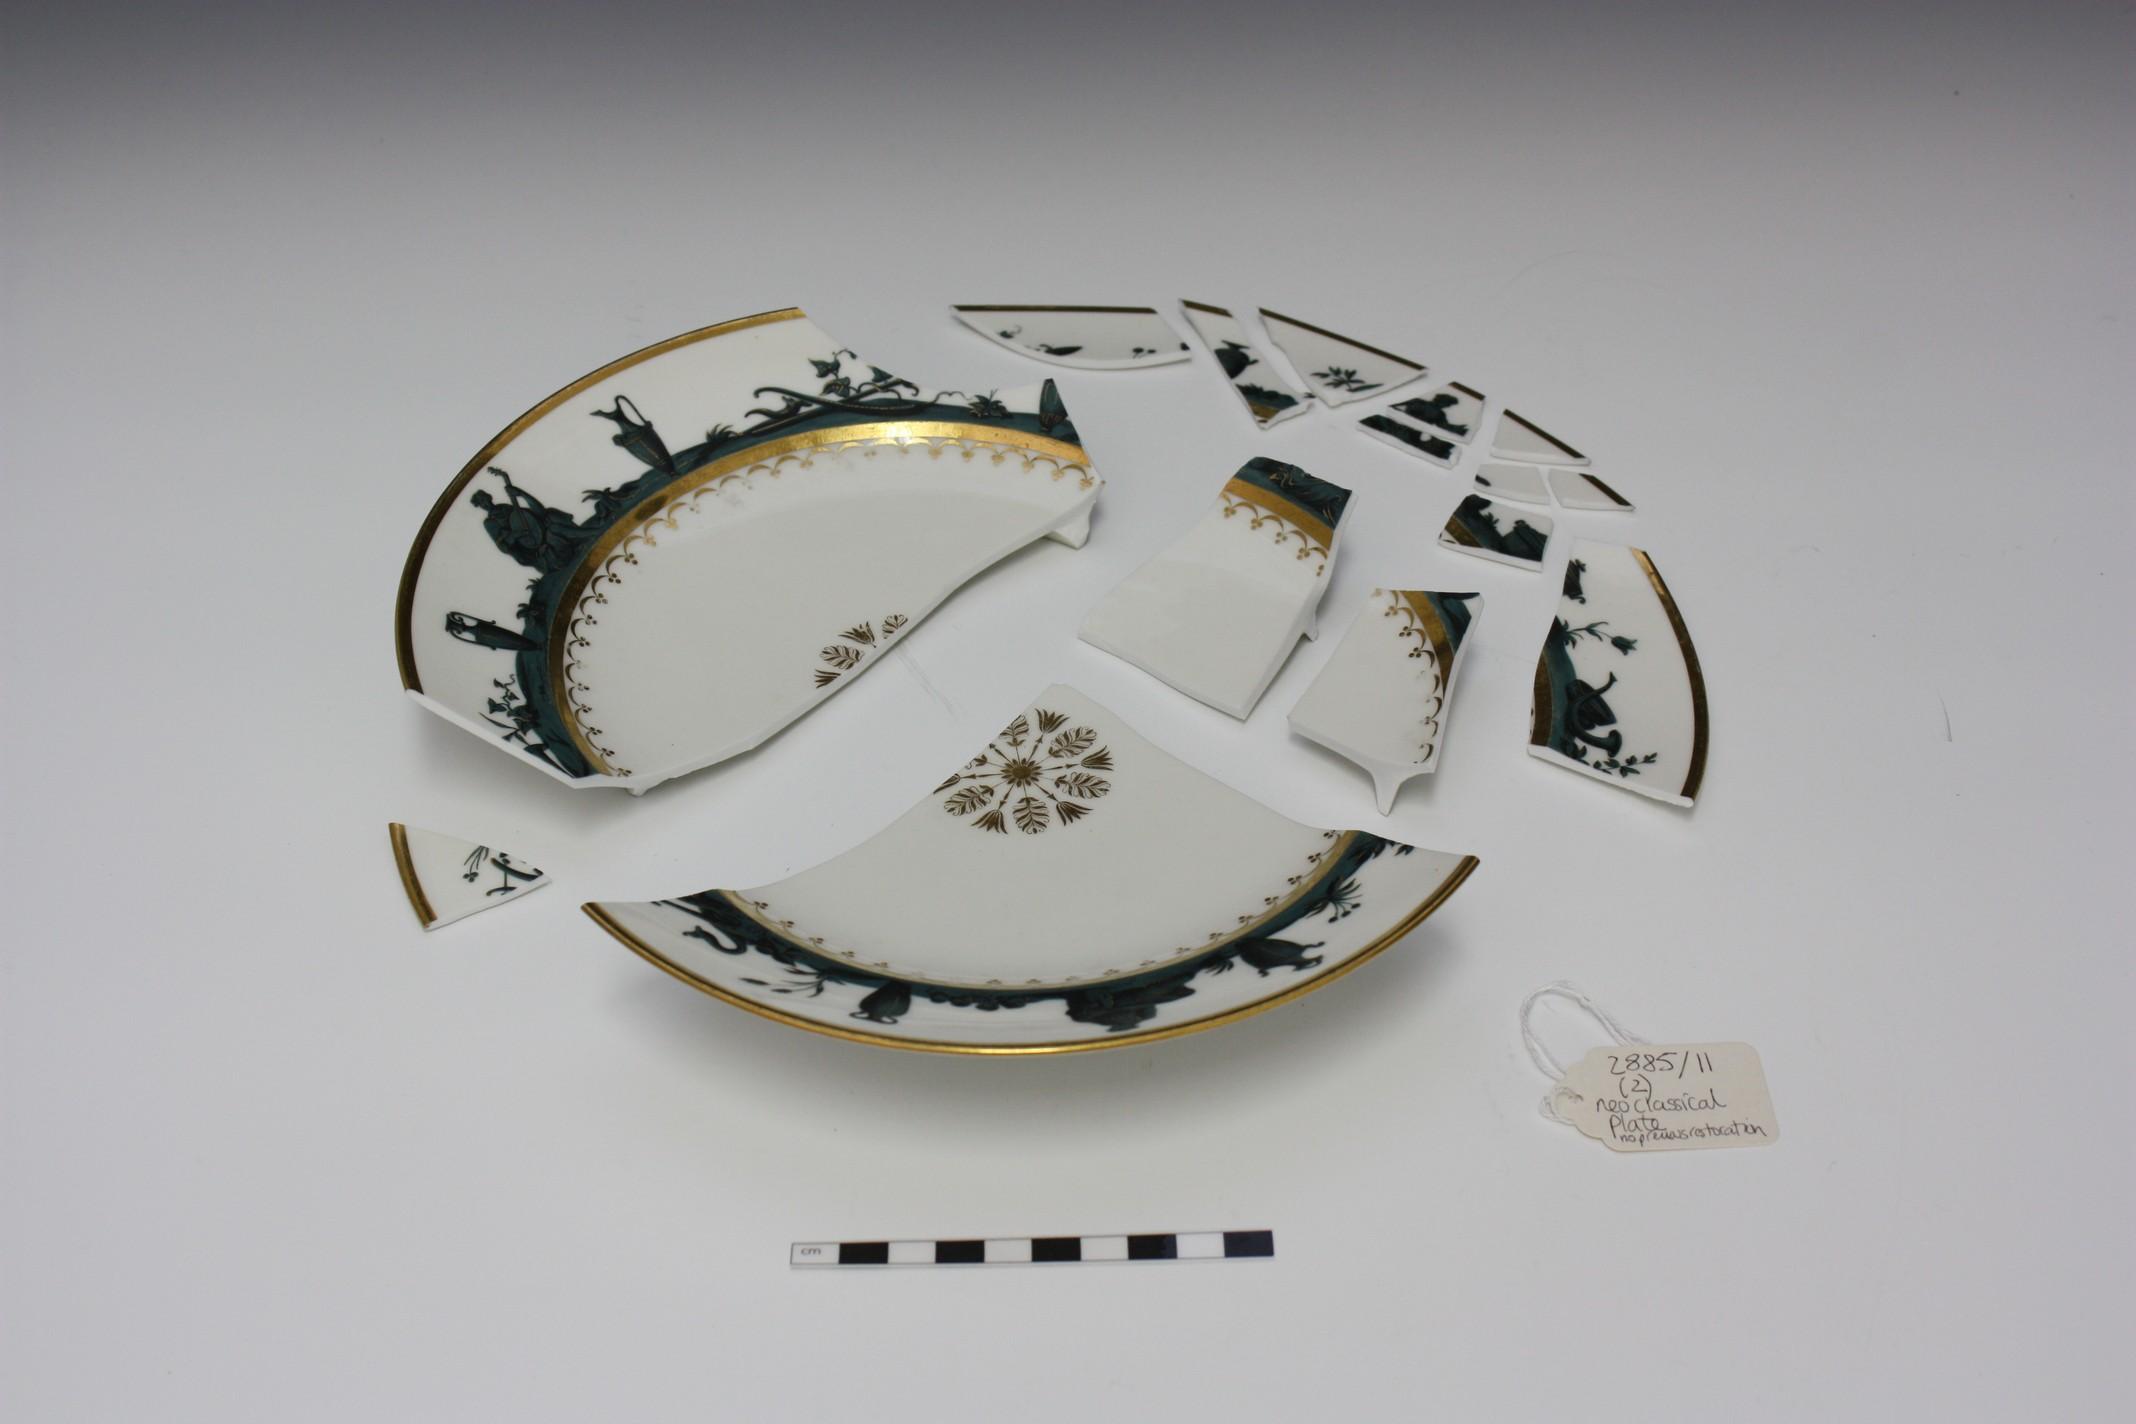 Dihl Guerhard neoclassical dish 01